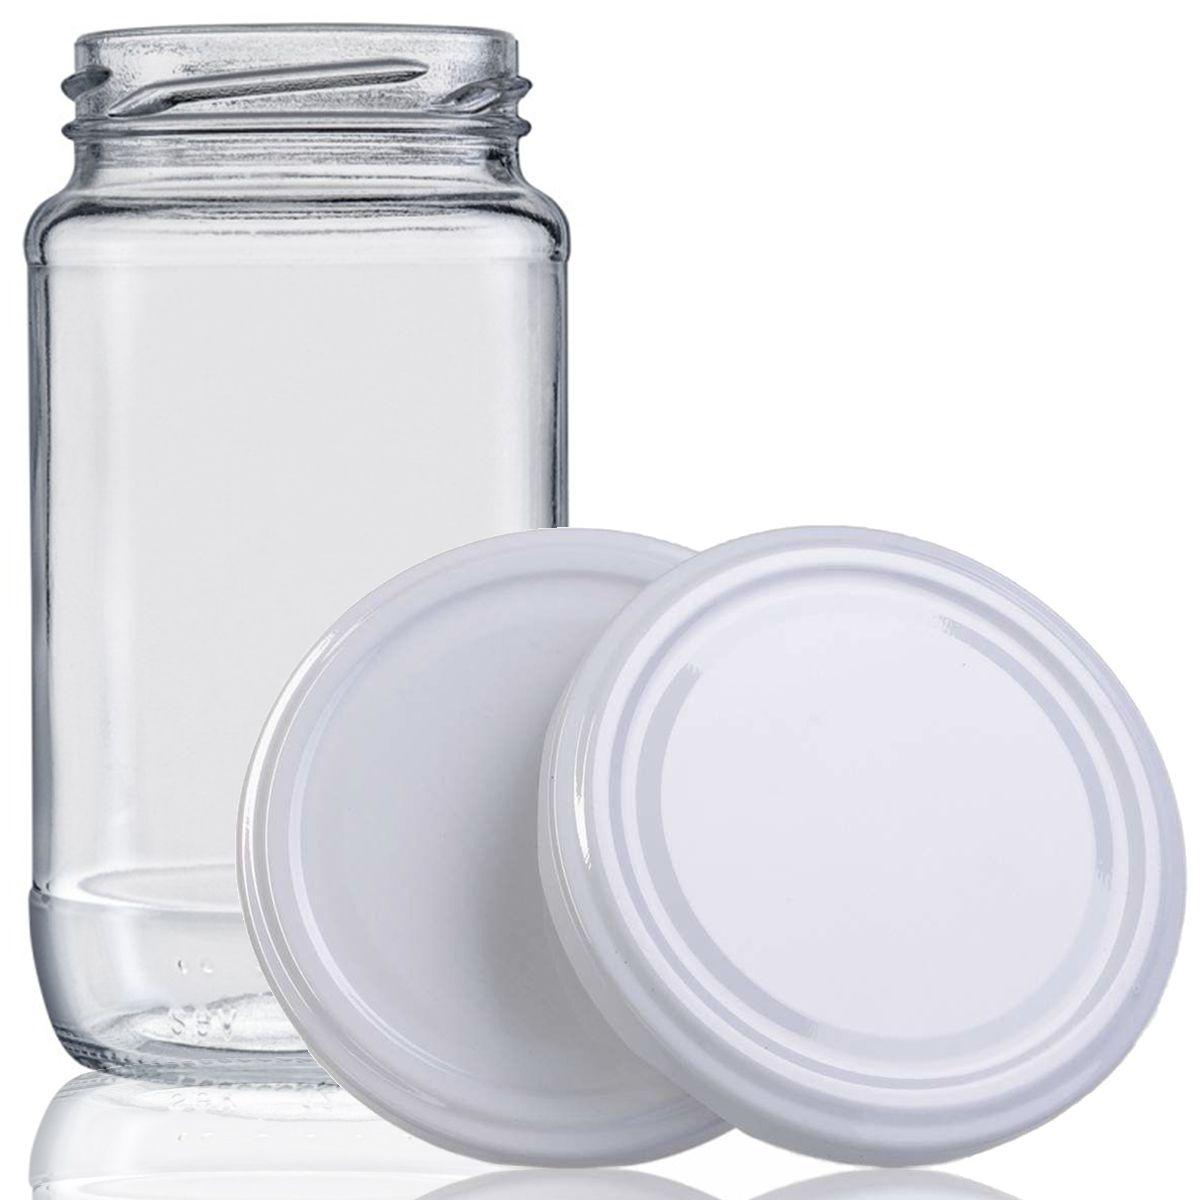 96 Potes De Vidro Azeitona 355 Ml Com Tampa Branca + Lacre  - EMPÓRIO PACK